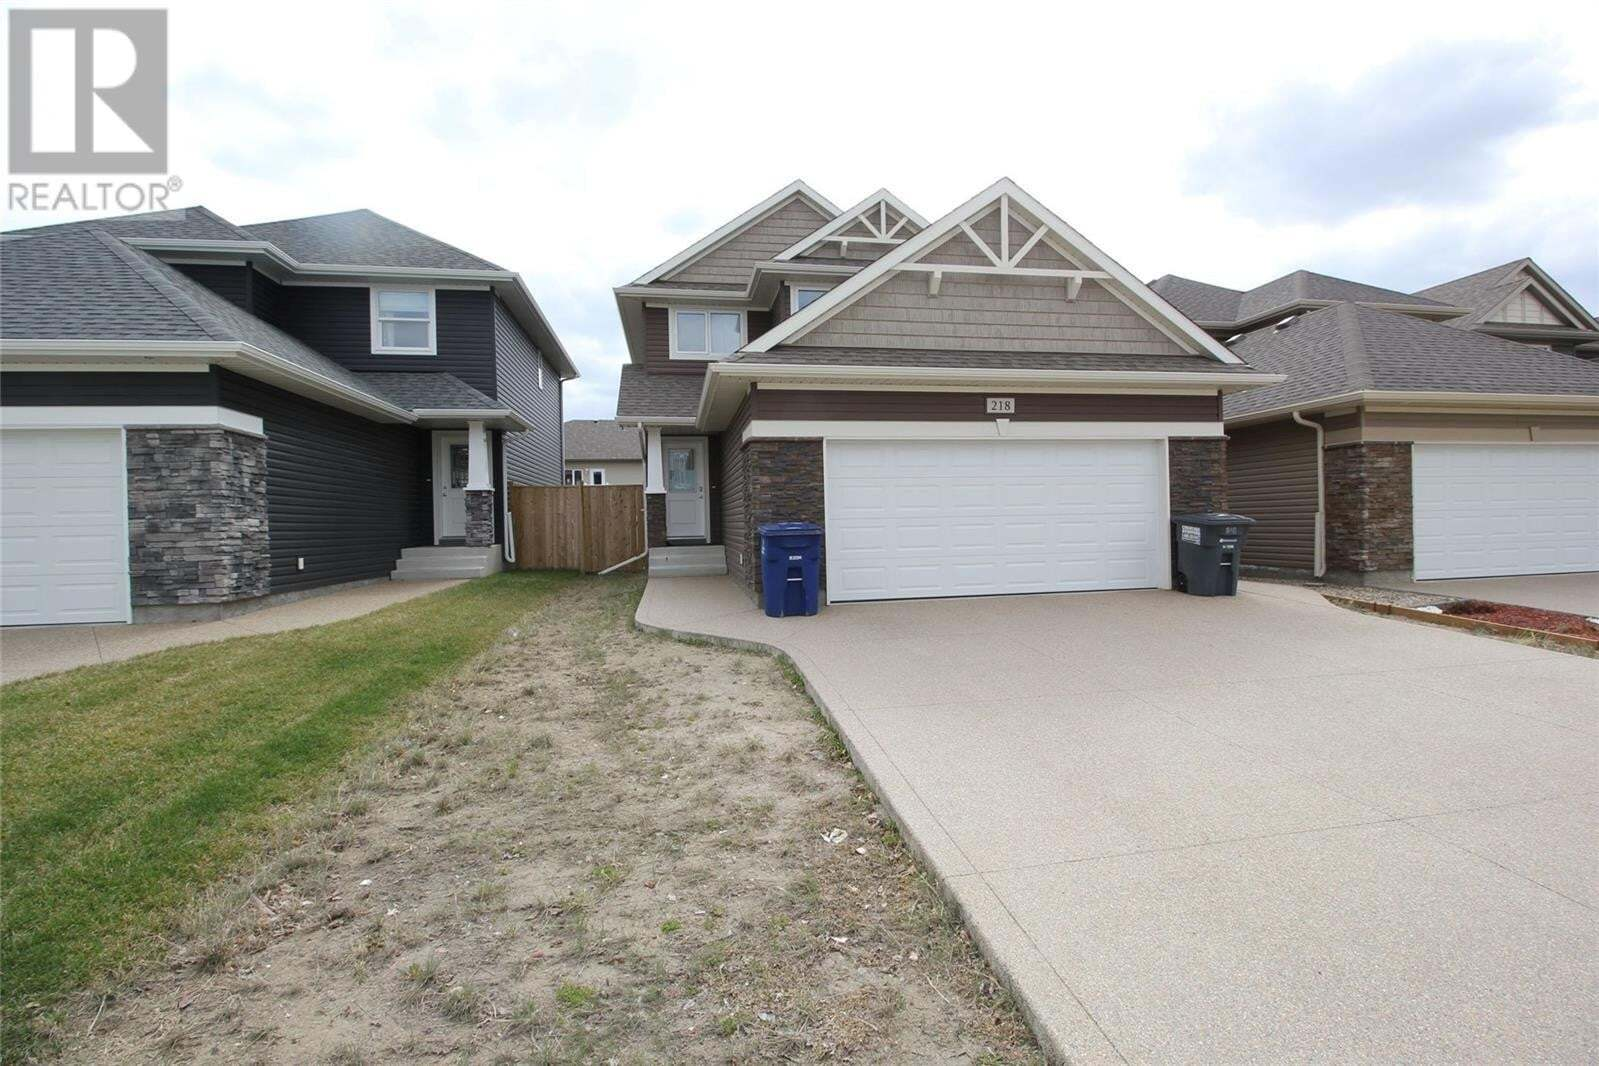 House for sale at 218 Lewin Cres Saskatoon Saskatchewan - MLS: SK808934